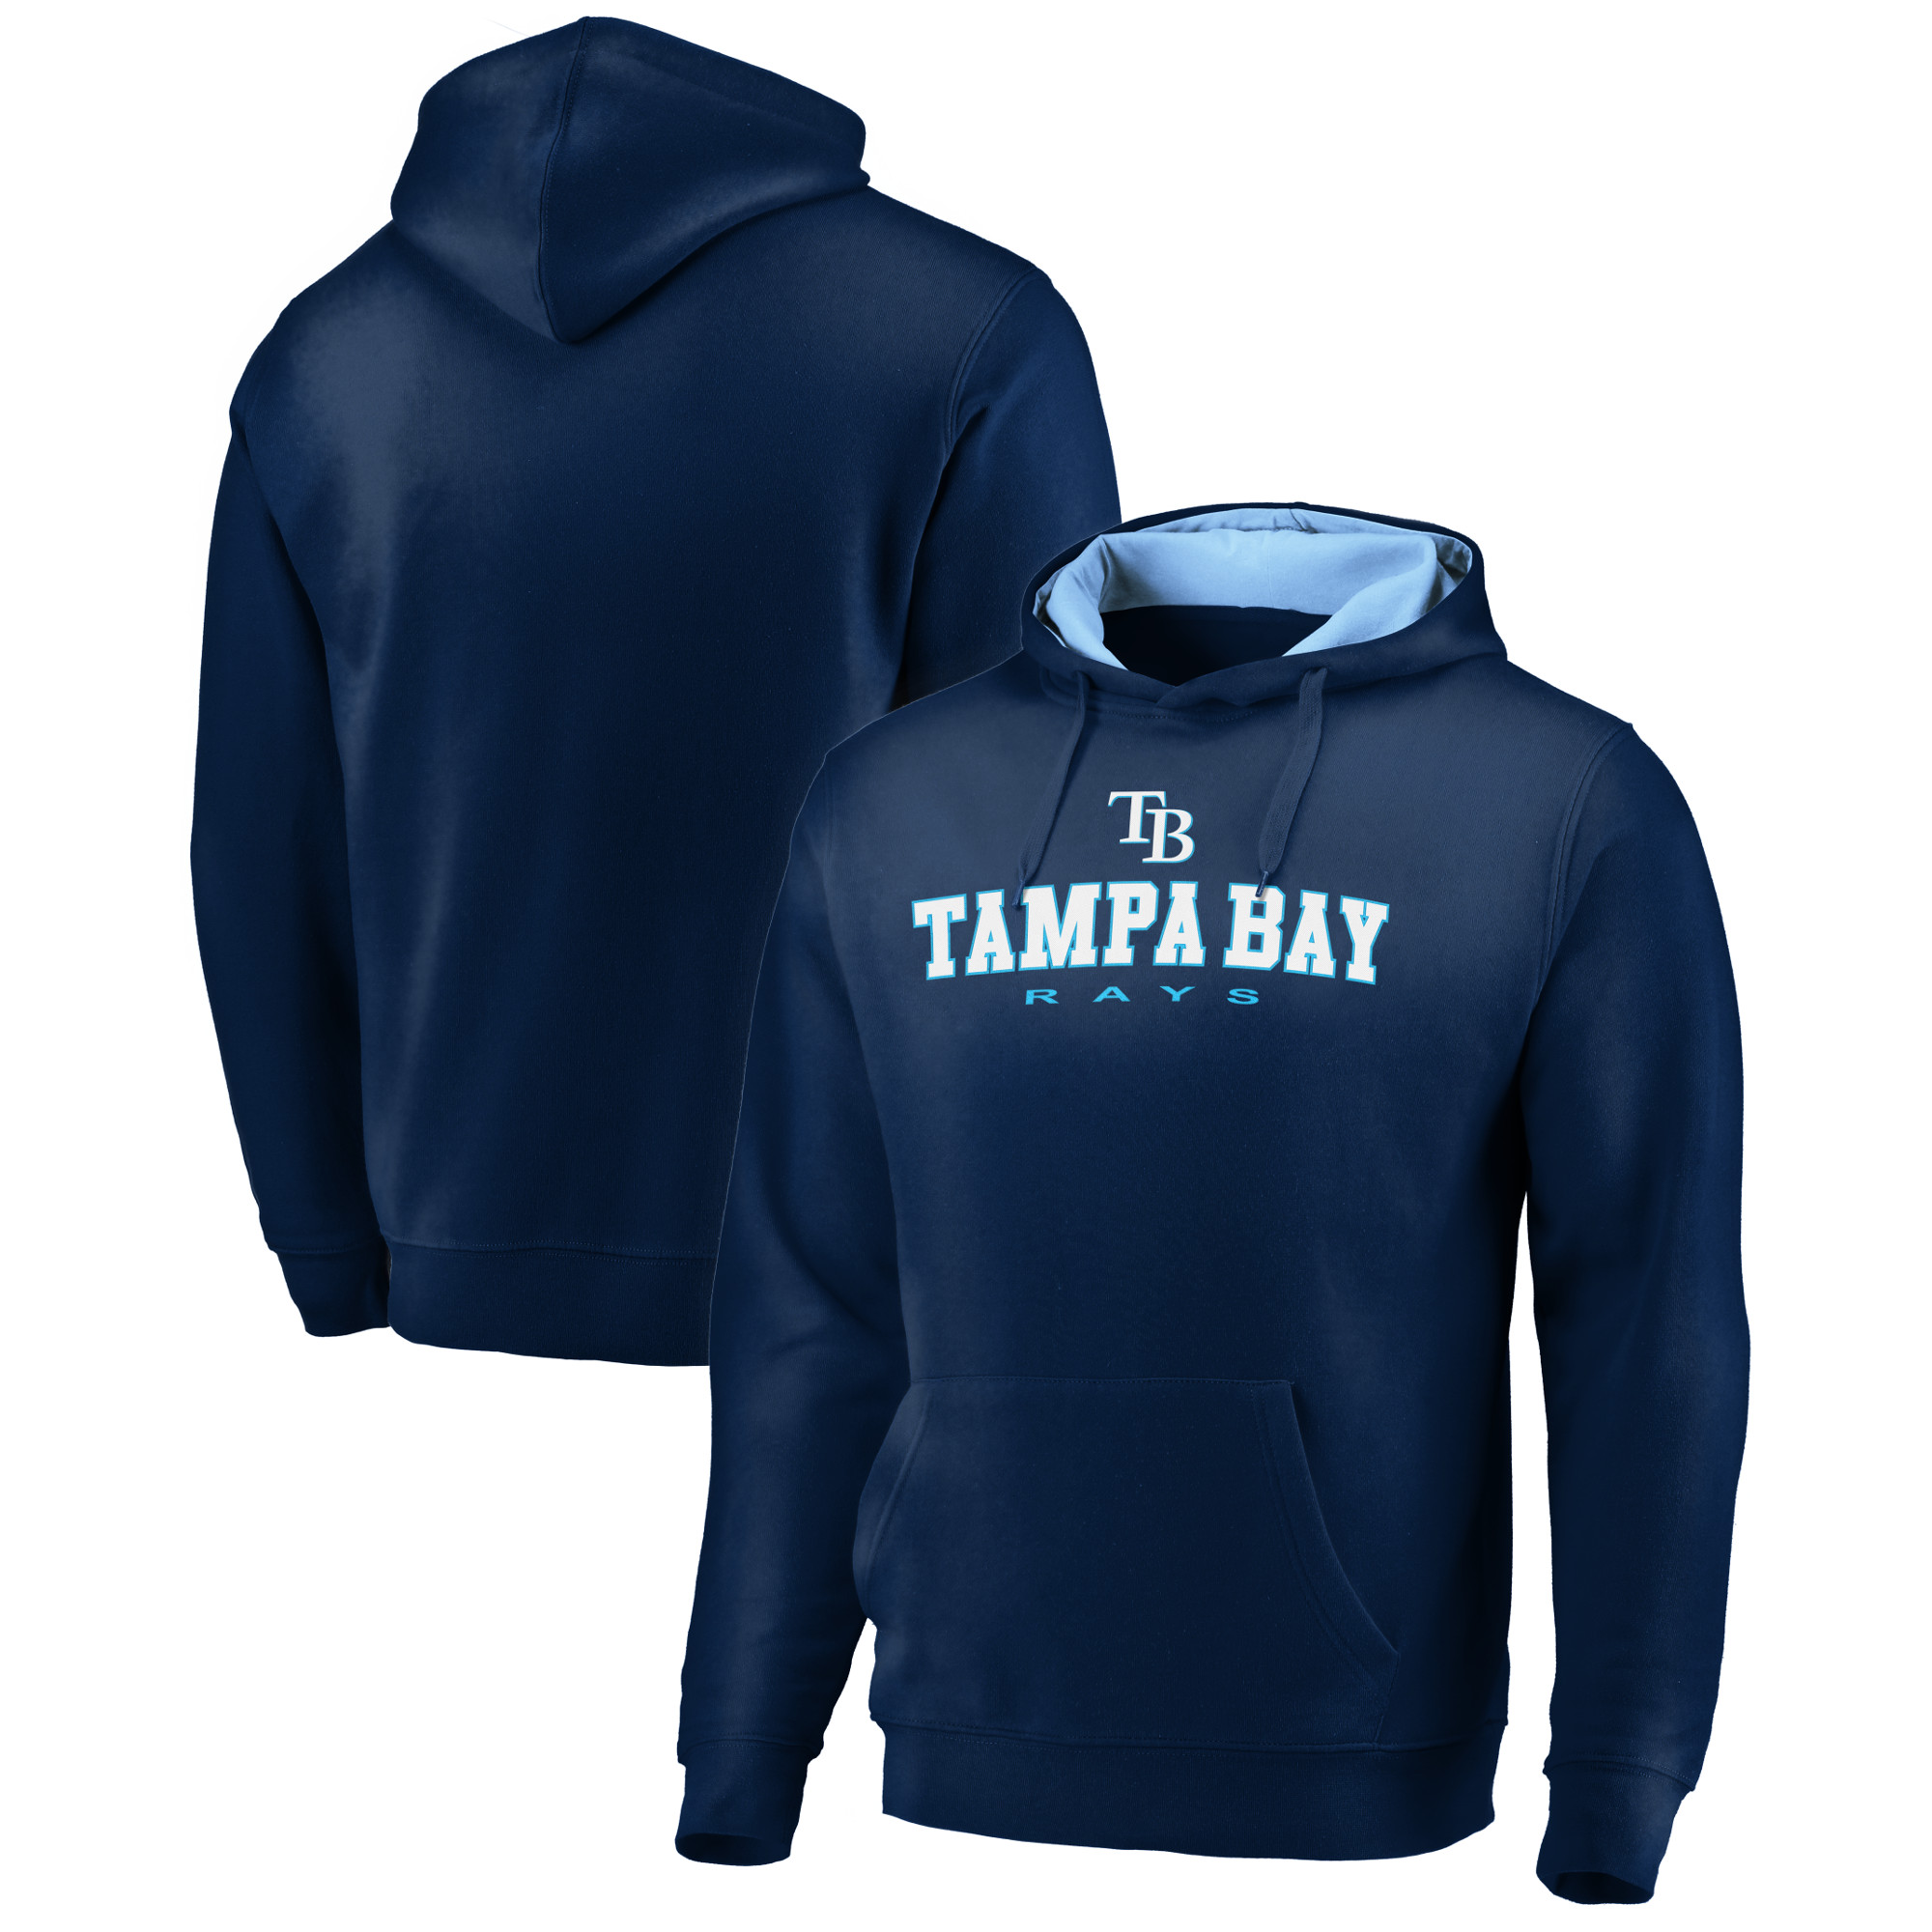 Tampa Bay Rays Fanatics Branded Big & Tall Block Lineup Zone Fleece Pullover Hoodie - Navy